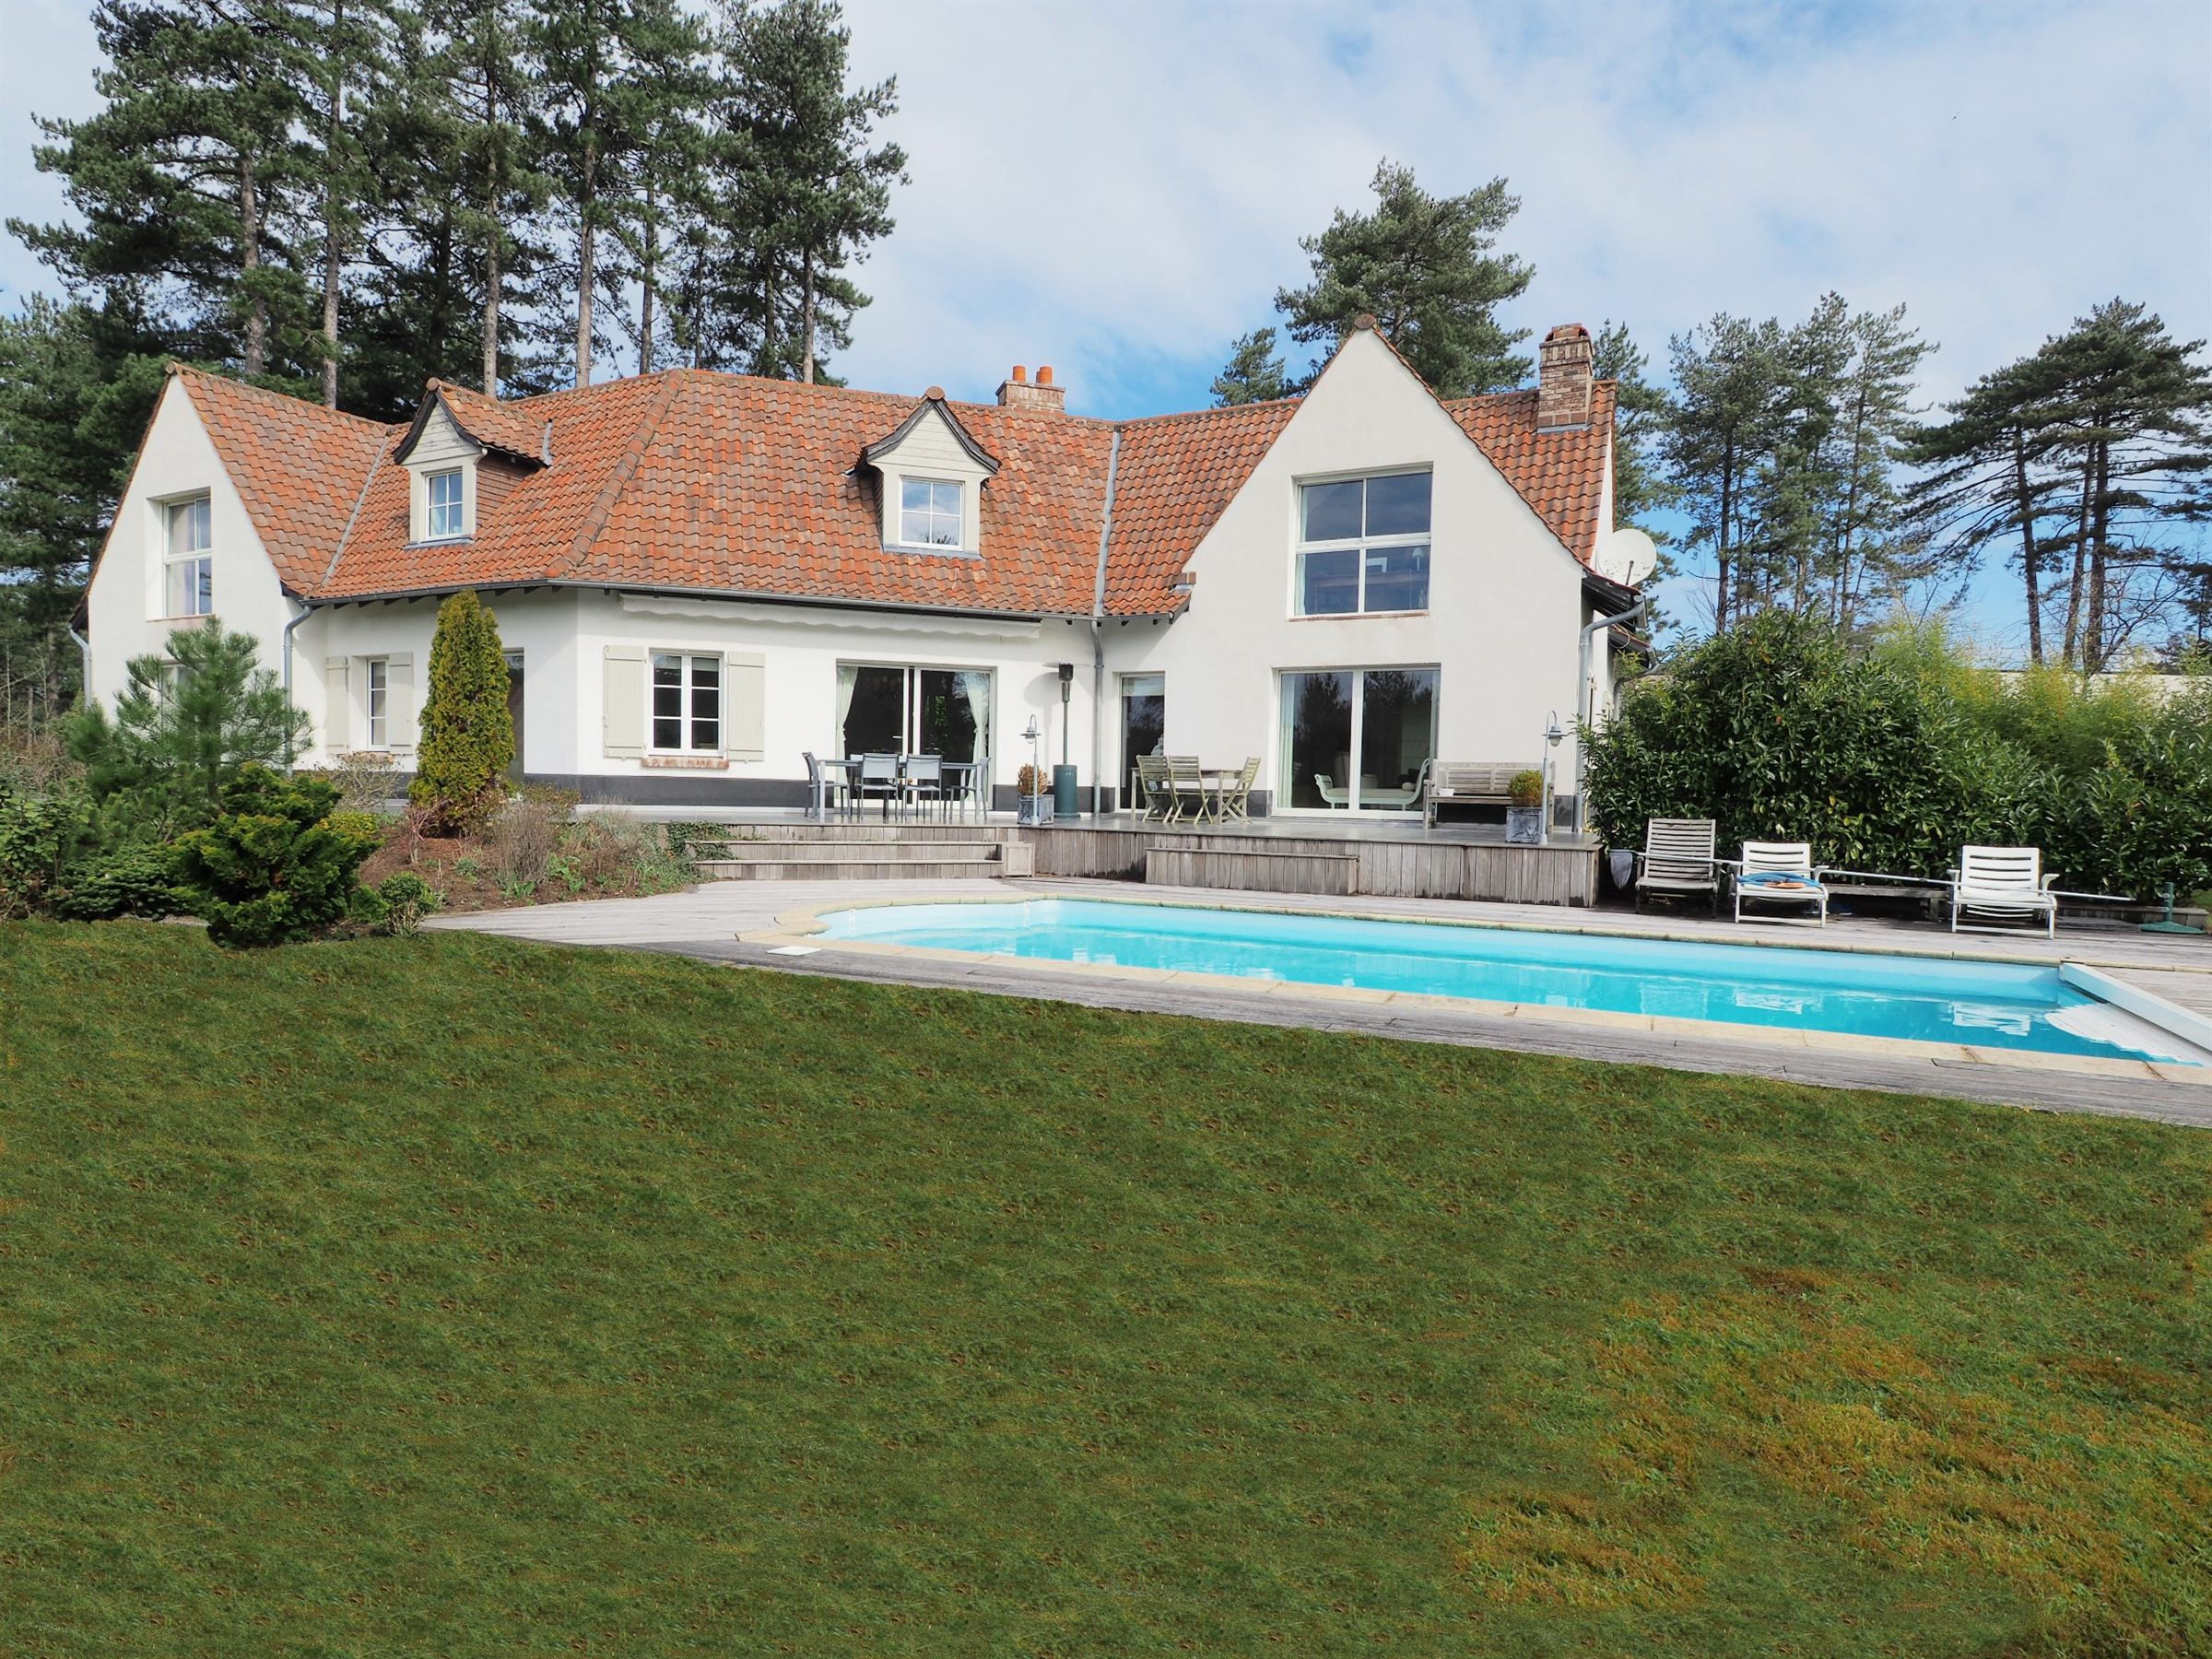 sales property at HARDELOT GOLF, 252sqm Luxury villa. 6 Br. swimming pool